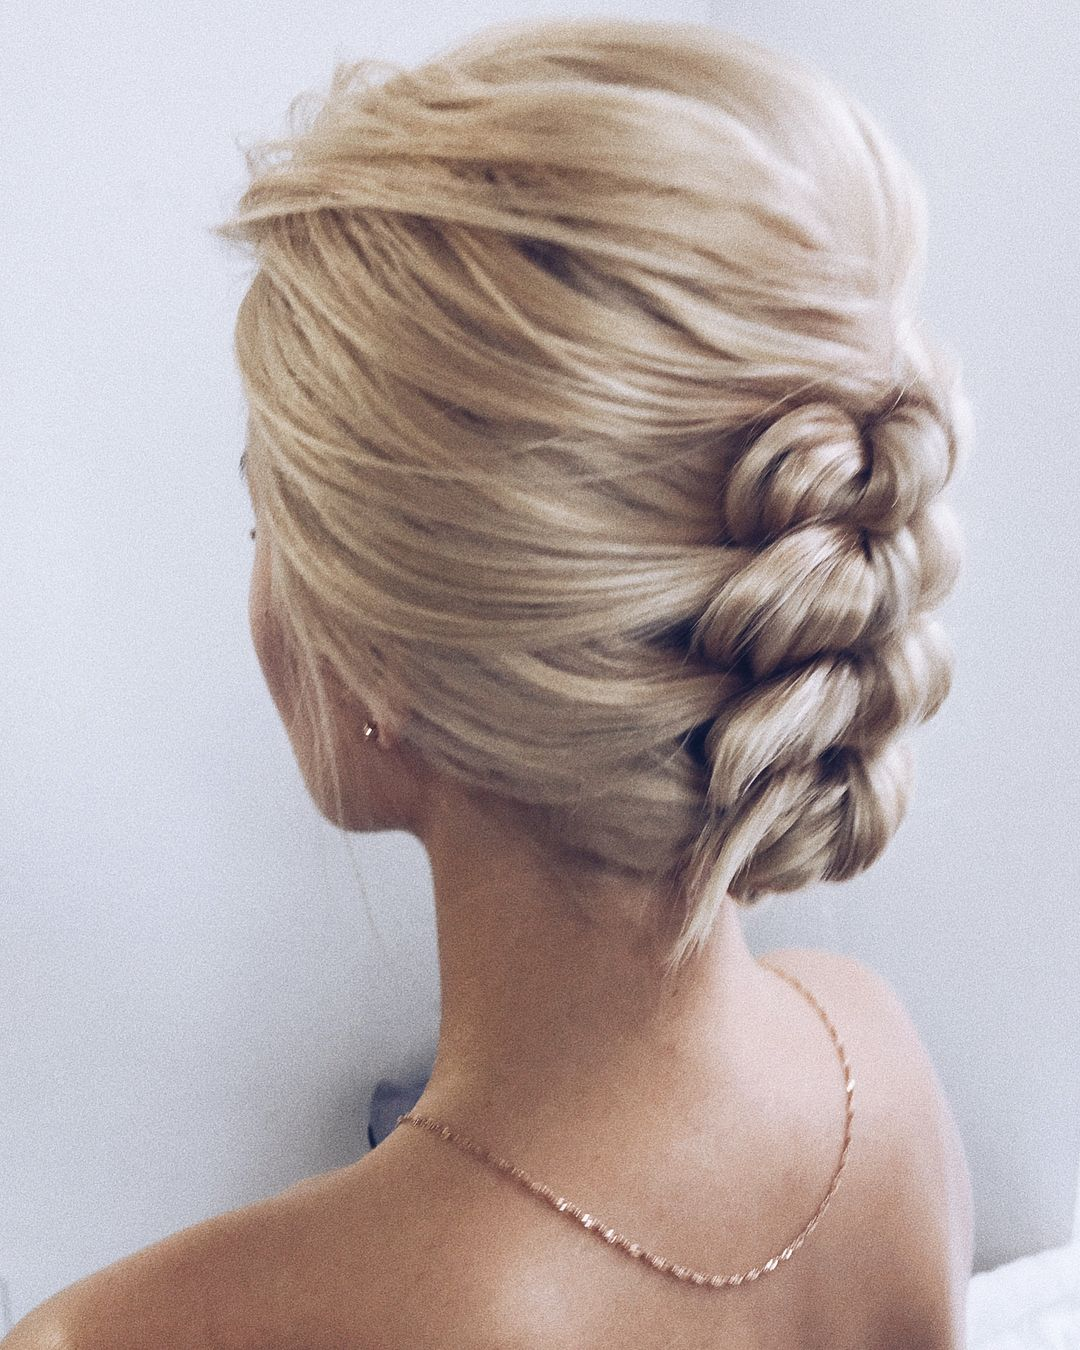 Beautiful Braided Updos Hairstyle by Lena Bogucharskaya